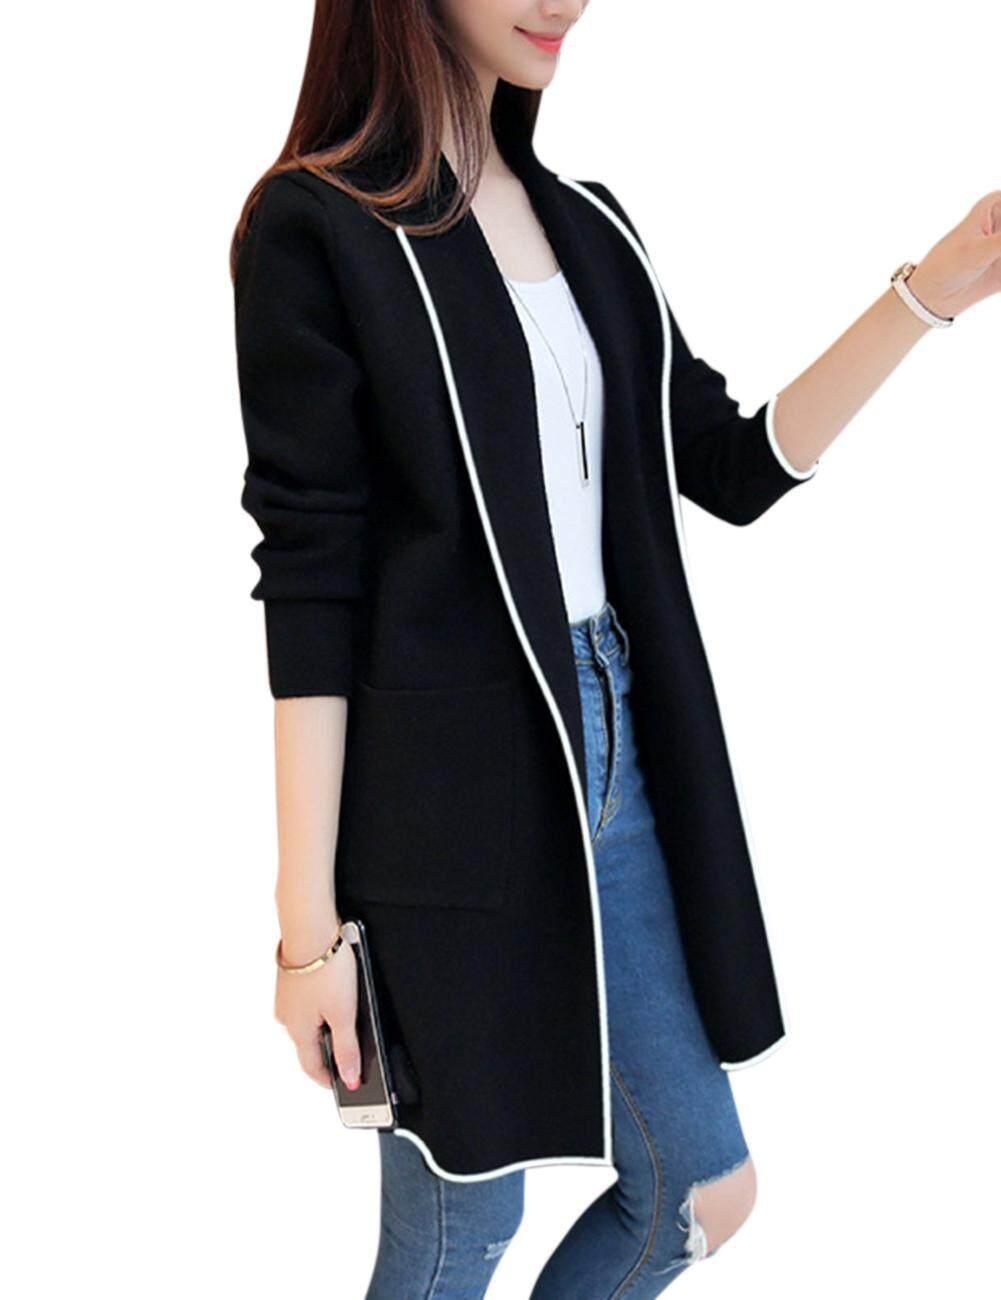 82bdf96a9 Women Fashion Loose Cardigan Classic Elegant All-match Tops Coat